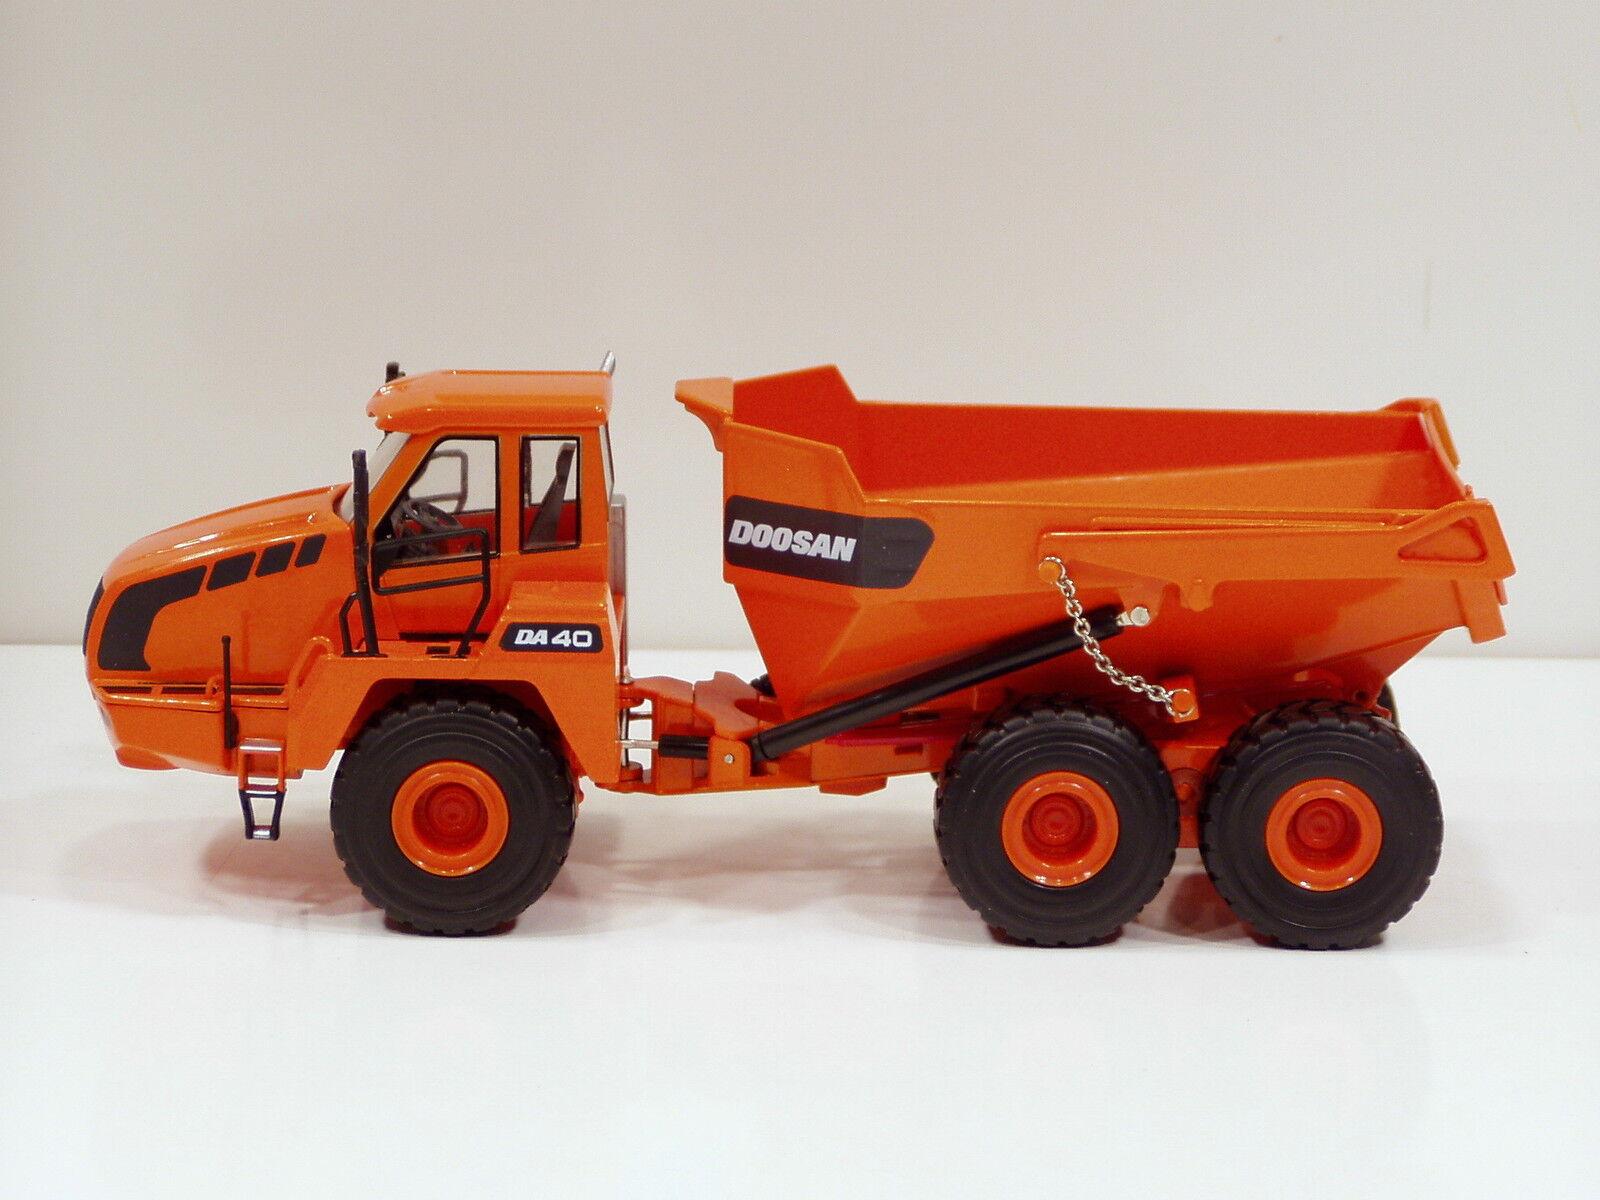 Doosan DA40 Dump Truck - 1 50 - Brand New